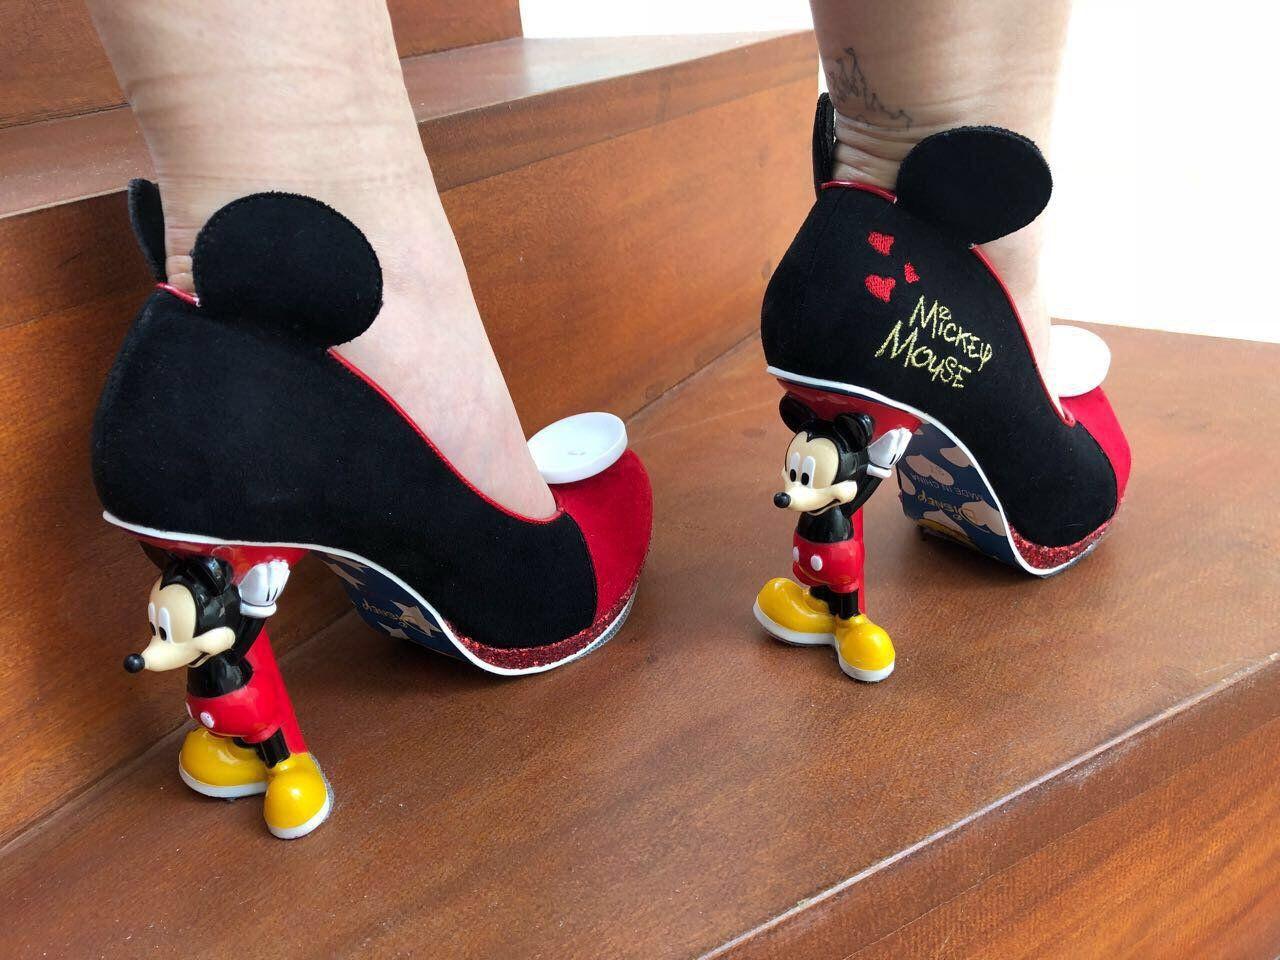 7a7bef88e062c Mickey Mouse no sapato  Larissa Manoela inovou com salto alto